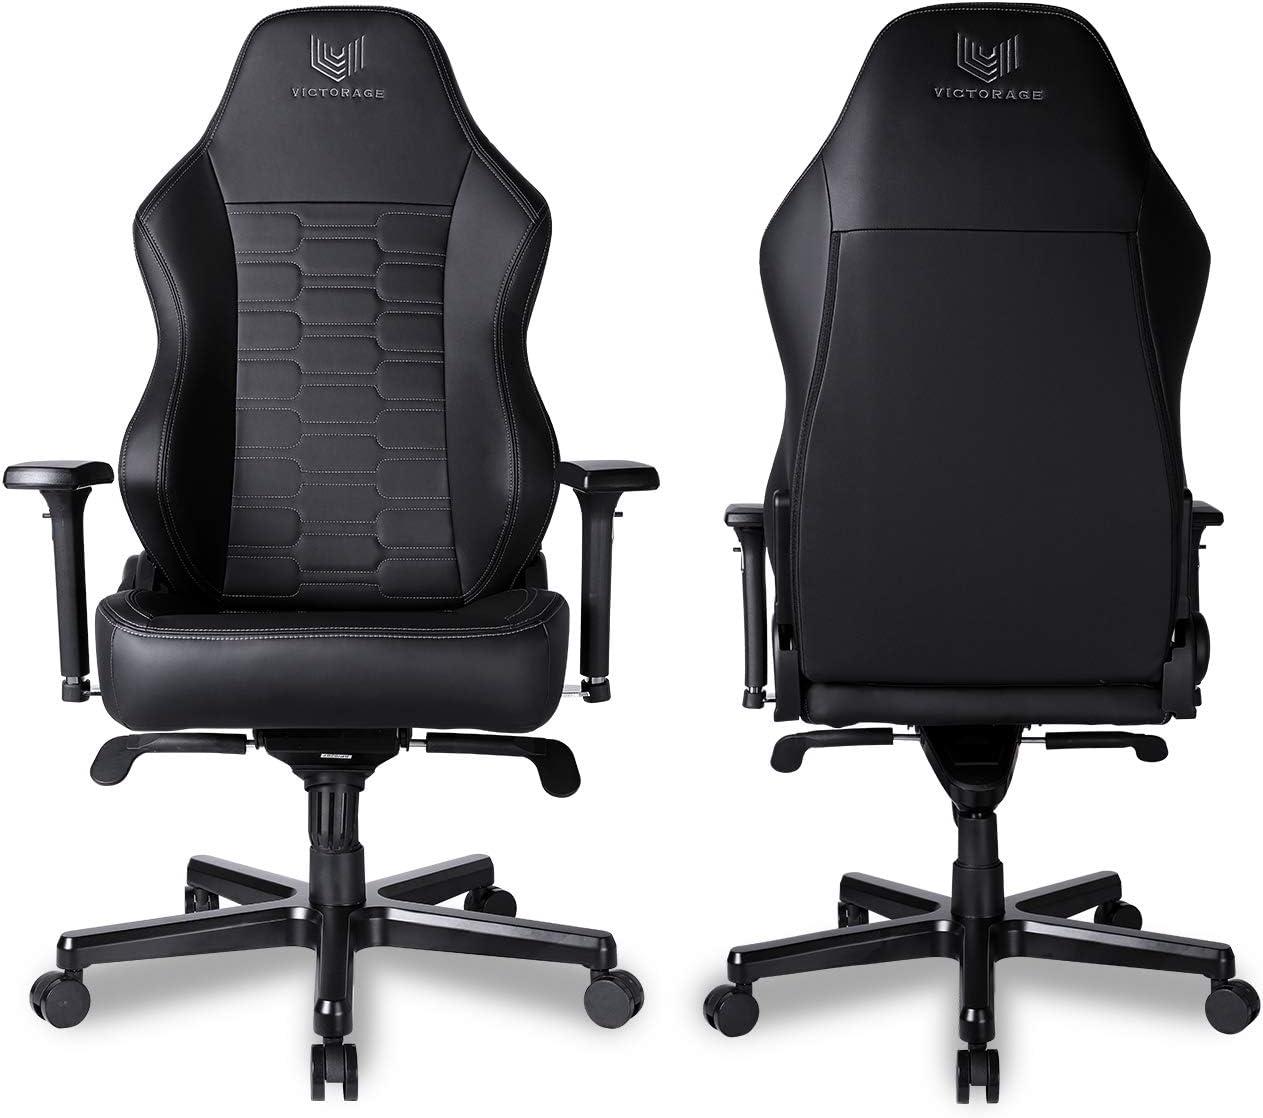 victorage-gaming-chair-design